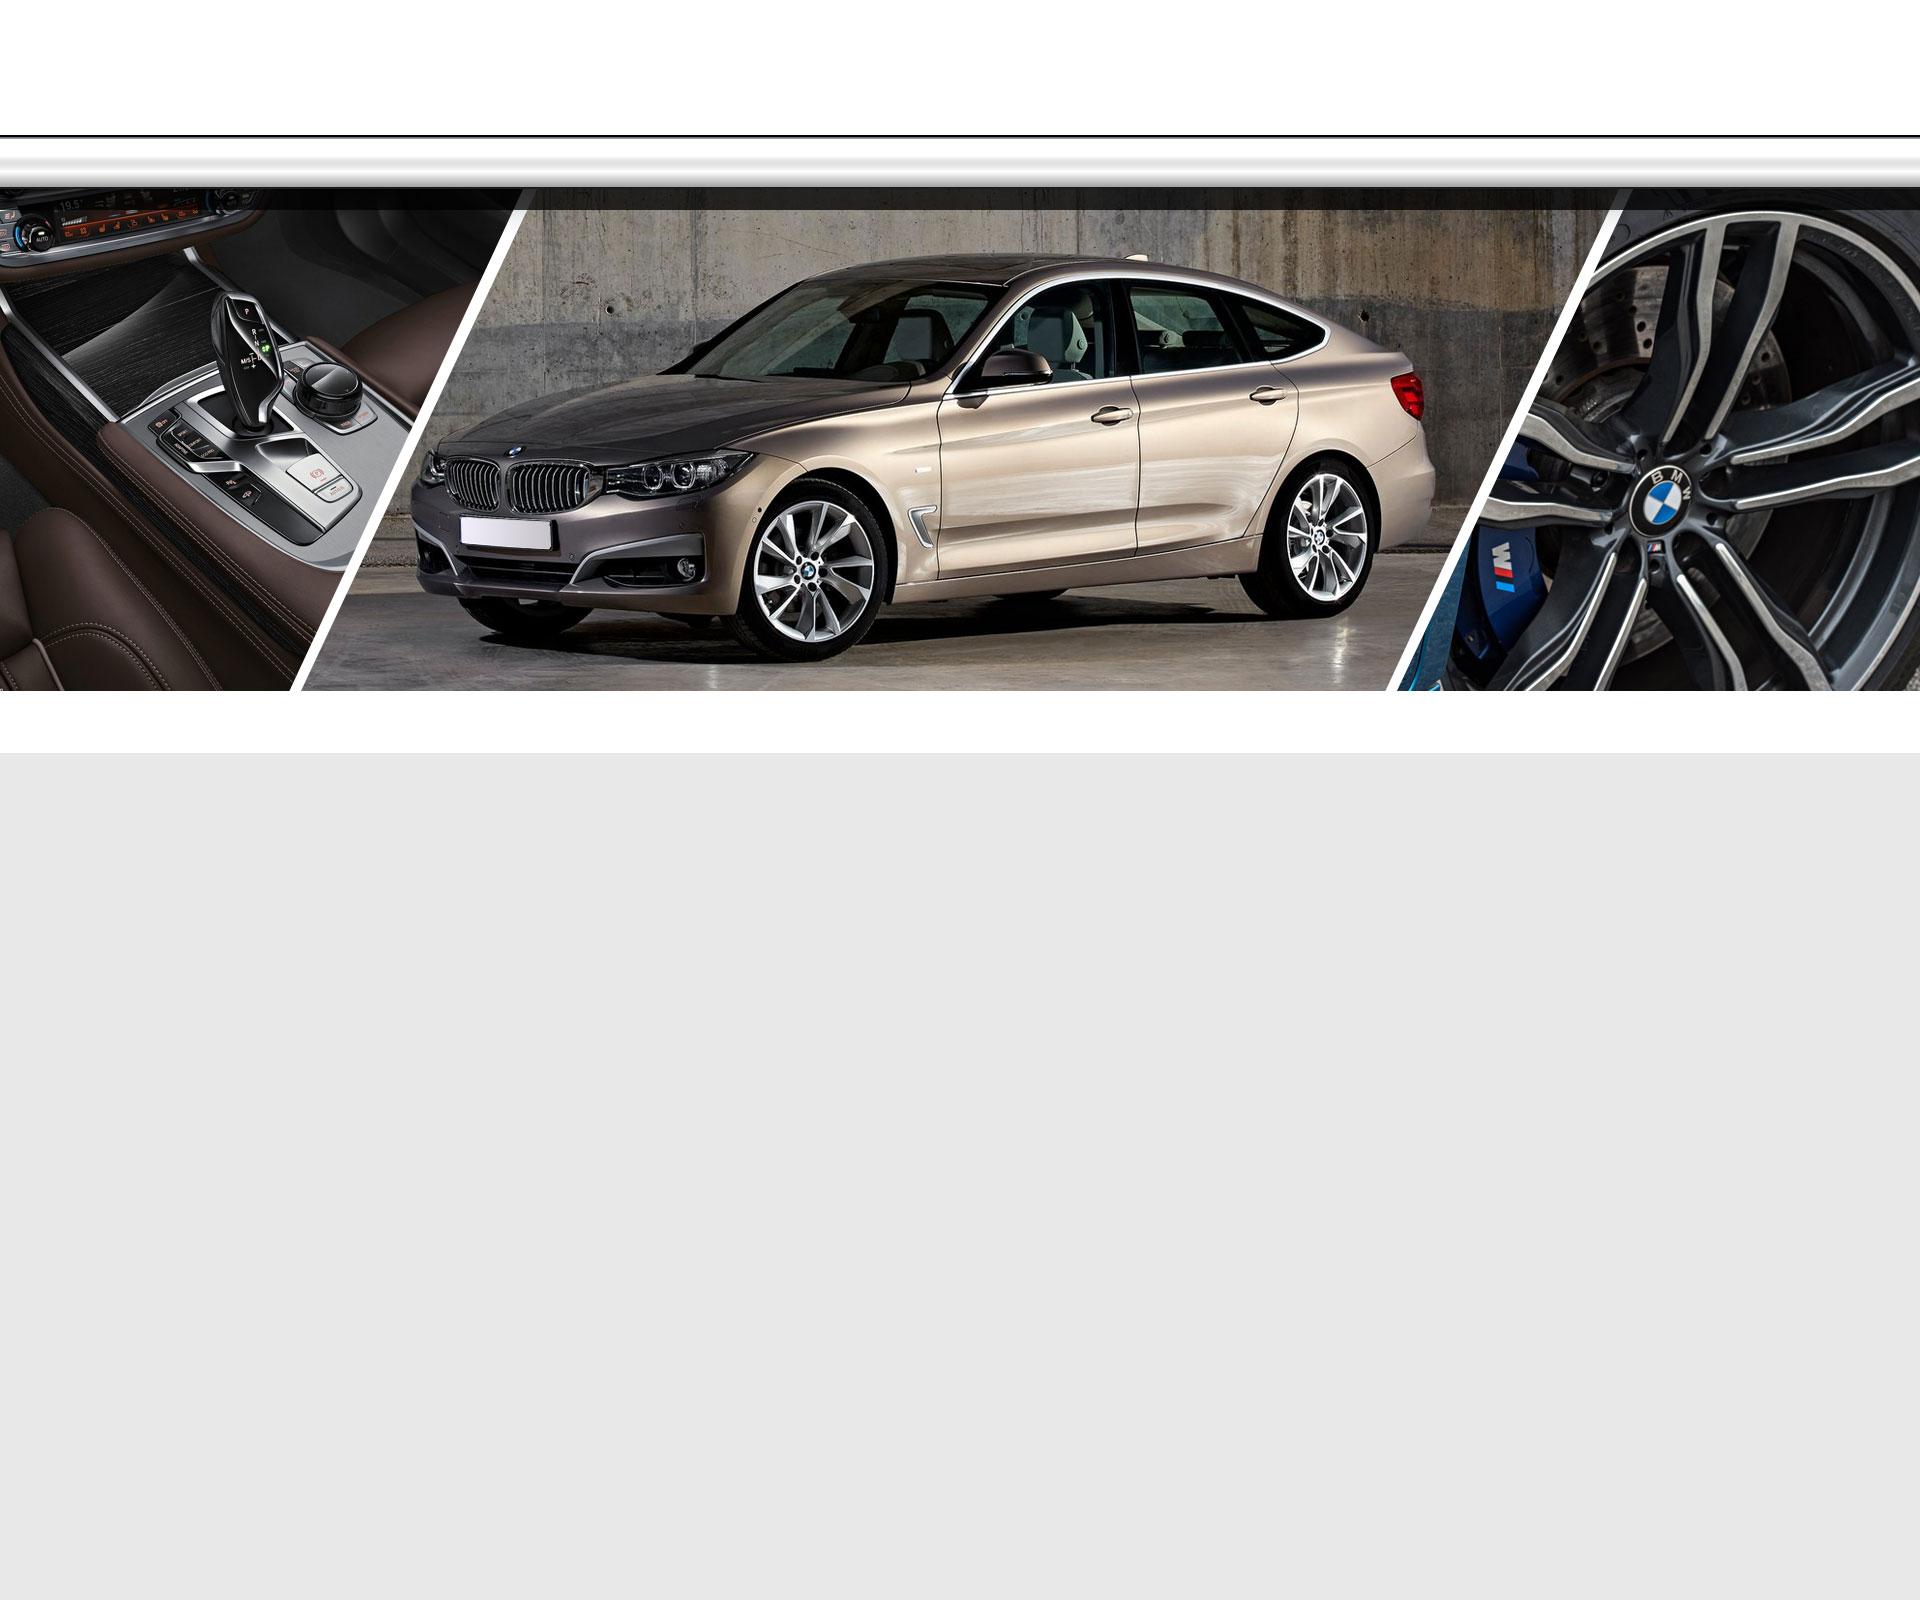 Acura Dealership Atlanta Area: Marietta Luxury Motors Review